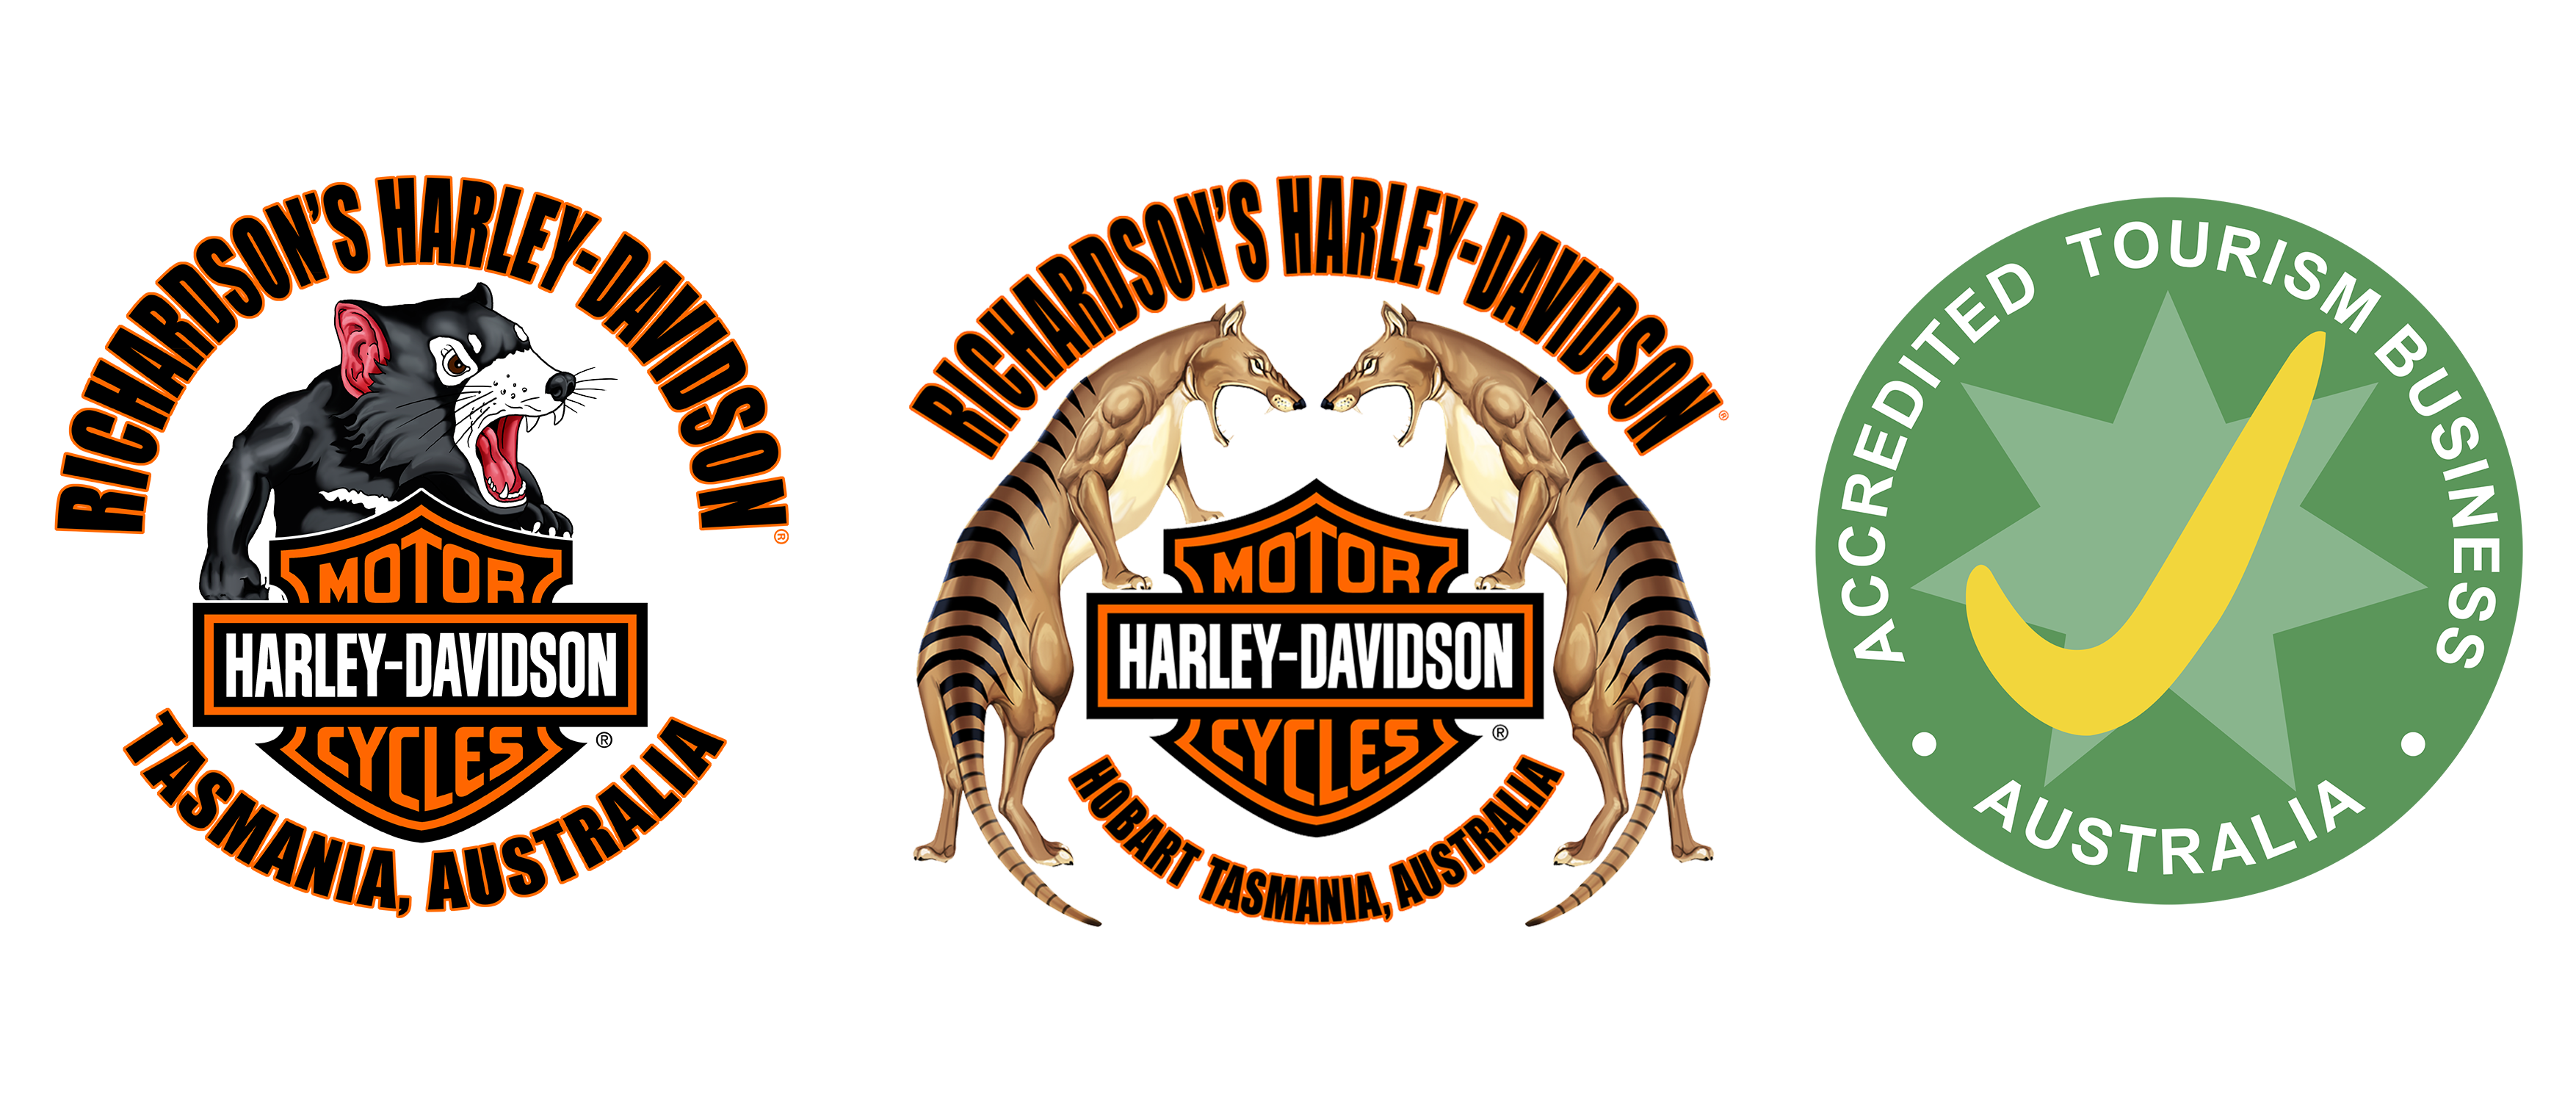 Richardson's Harley-Davidson<sup>&reg;</sup>